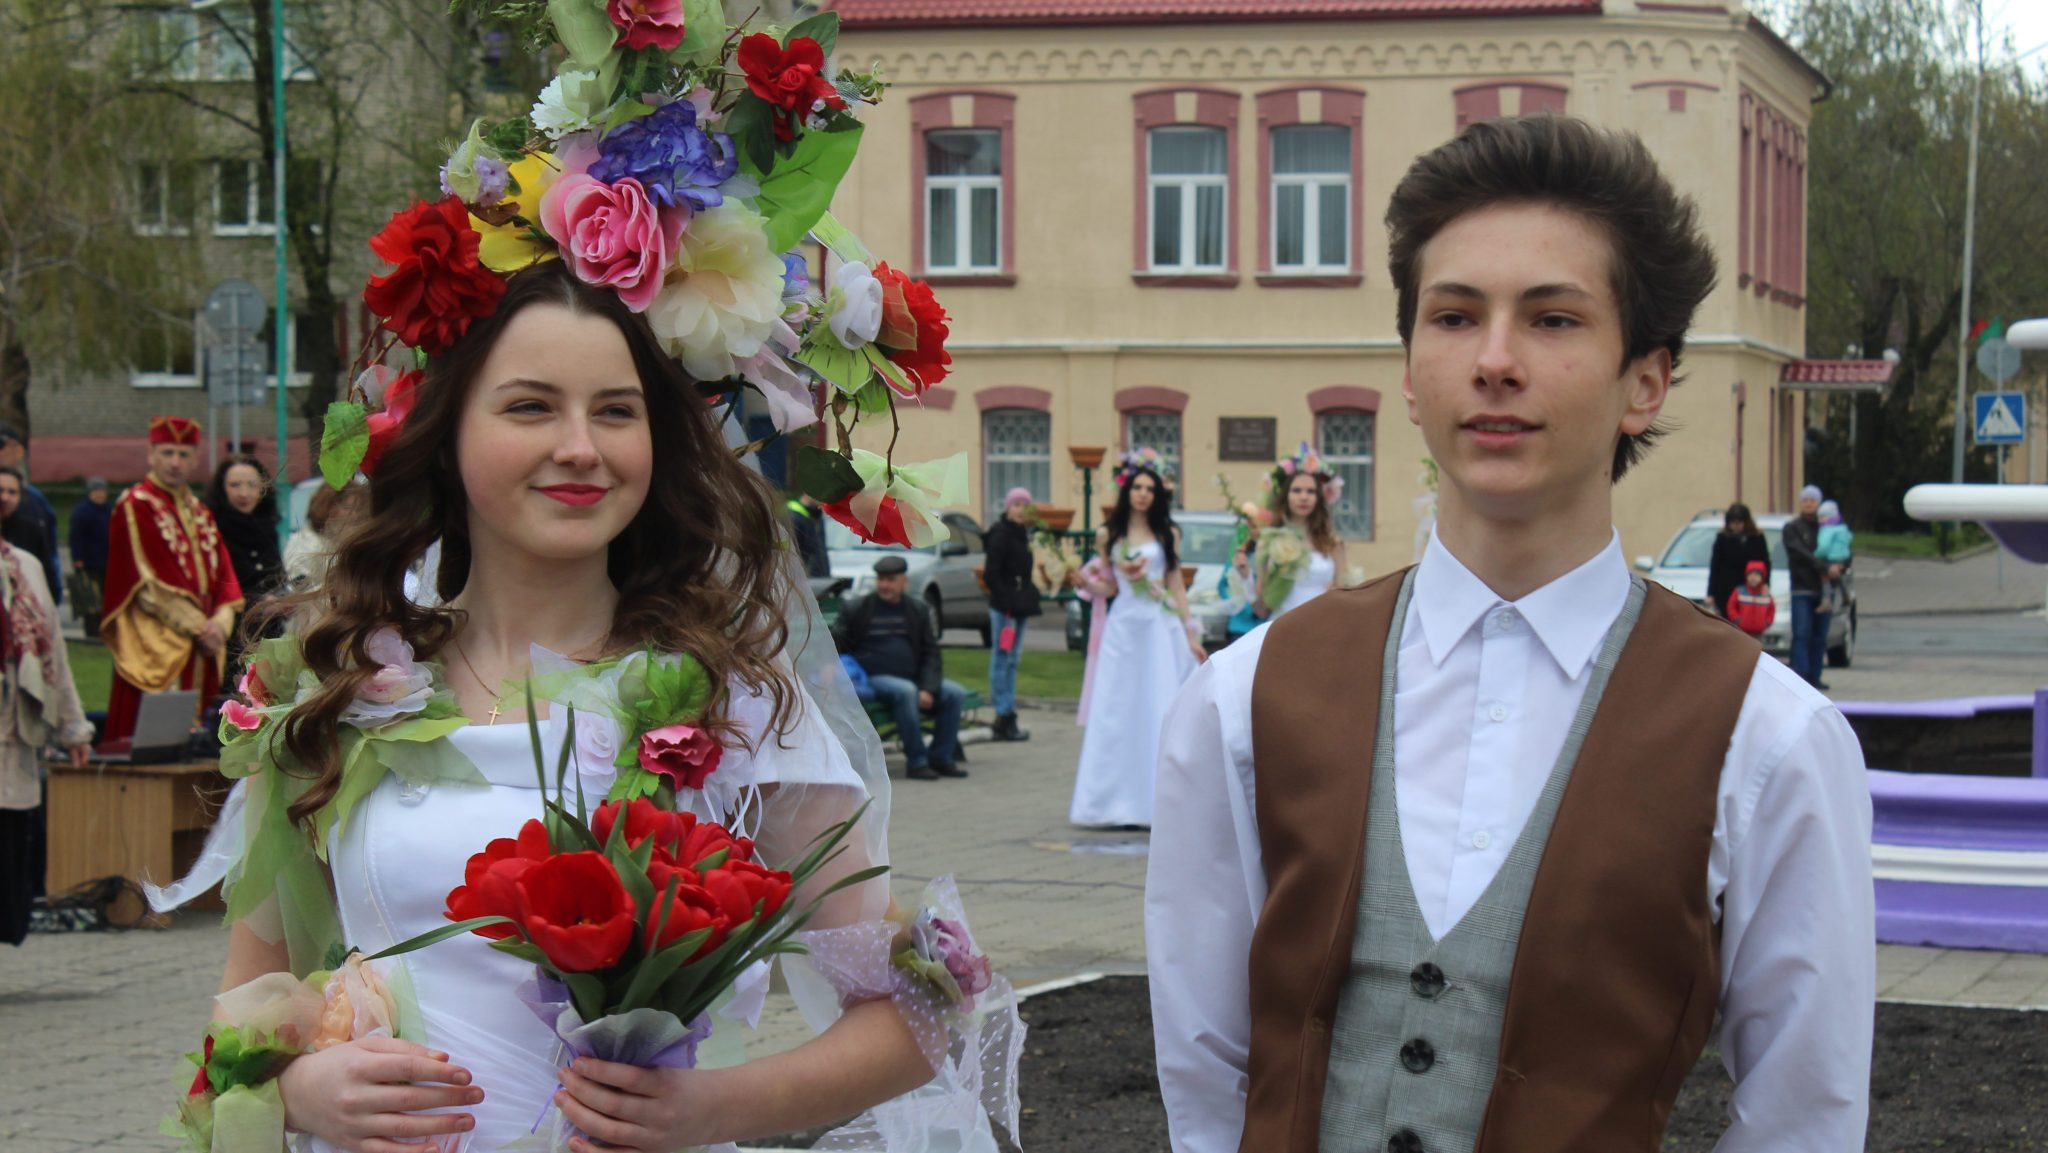 Праздник 1 мая. Фоторепортаж с белорусского дня труда